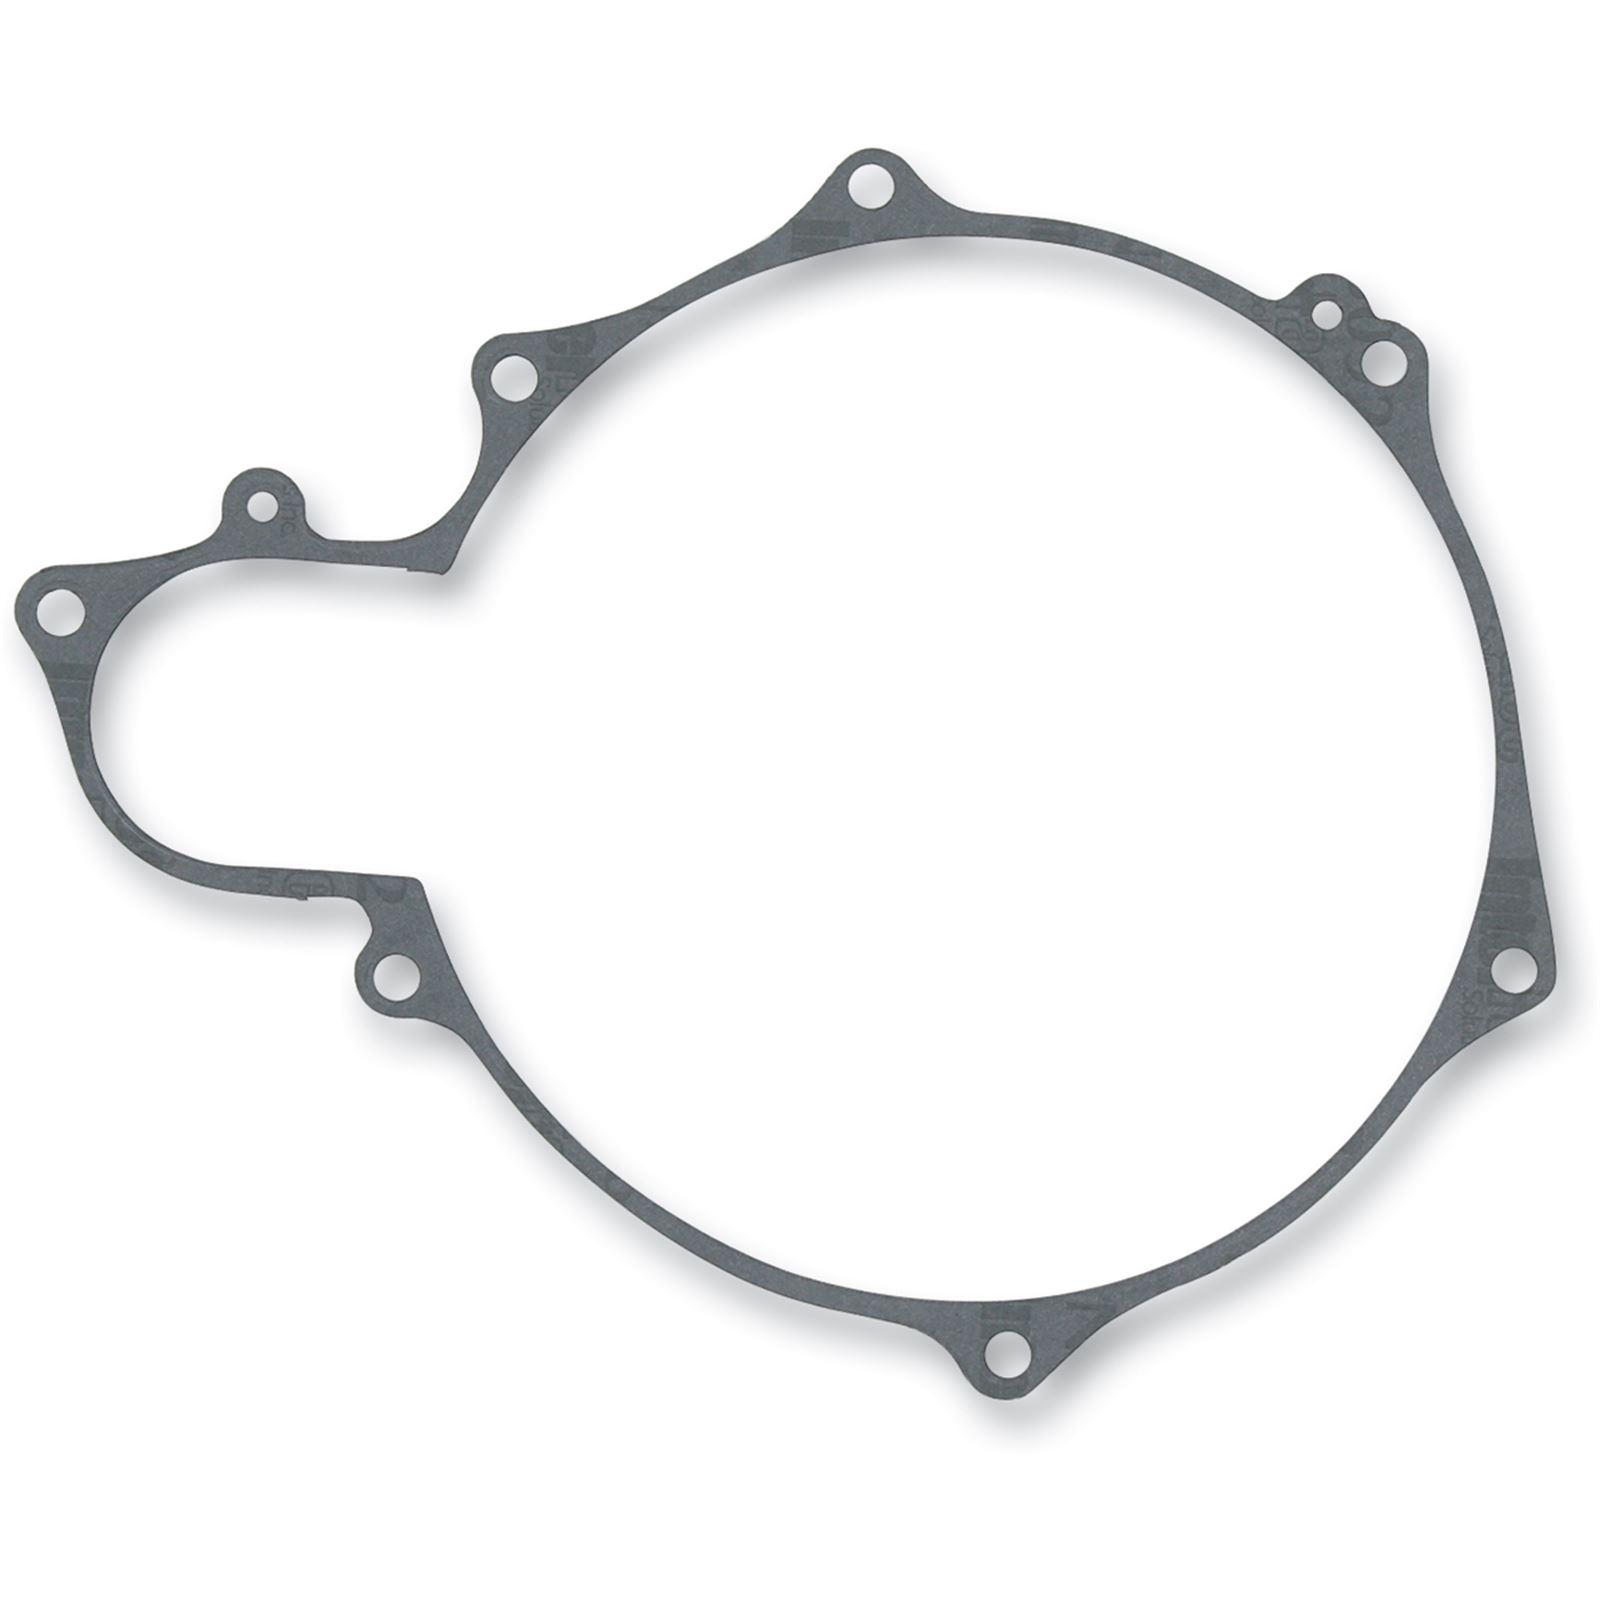 Moose Racing Clutch Cover Gasket YZ250